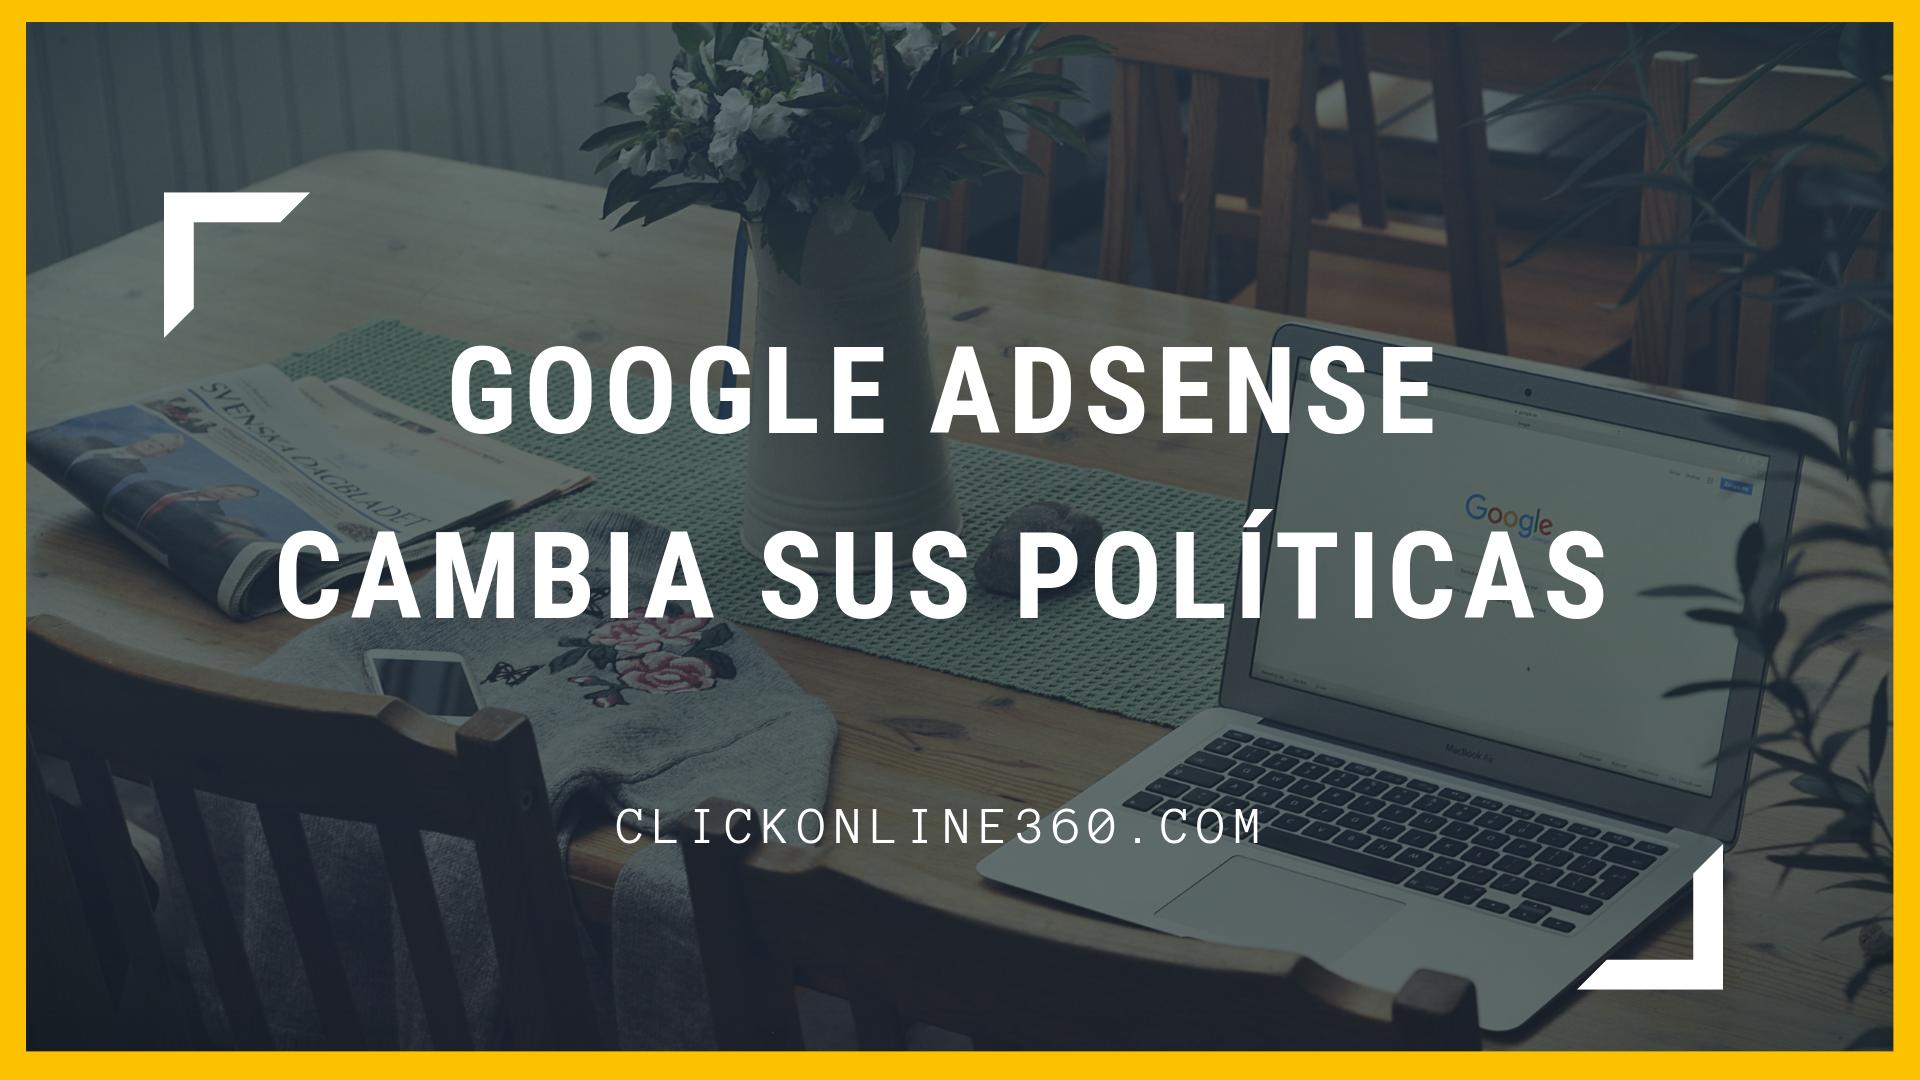 Google Adsense modifica sus políticas de anuncios 1